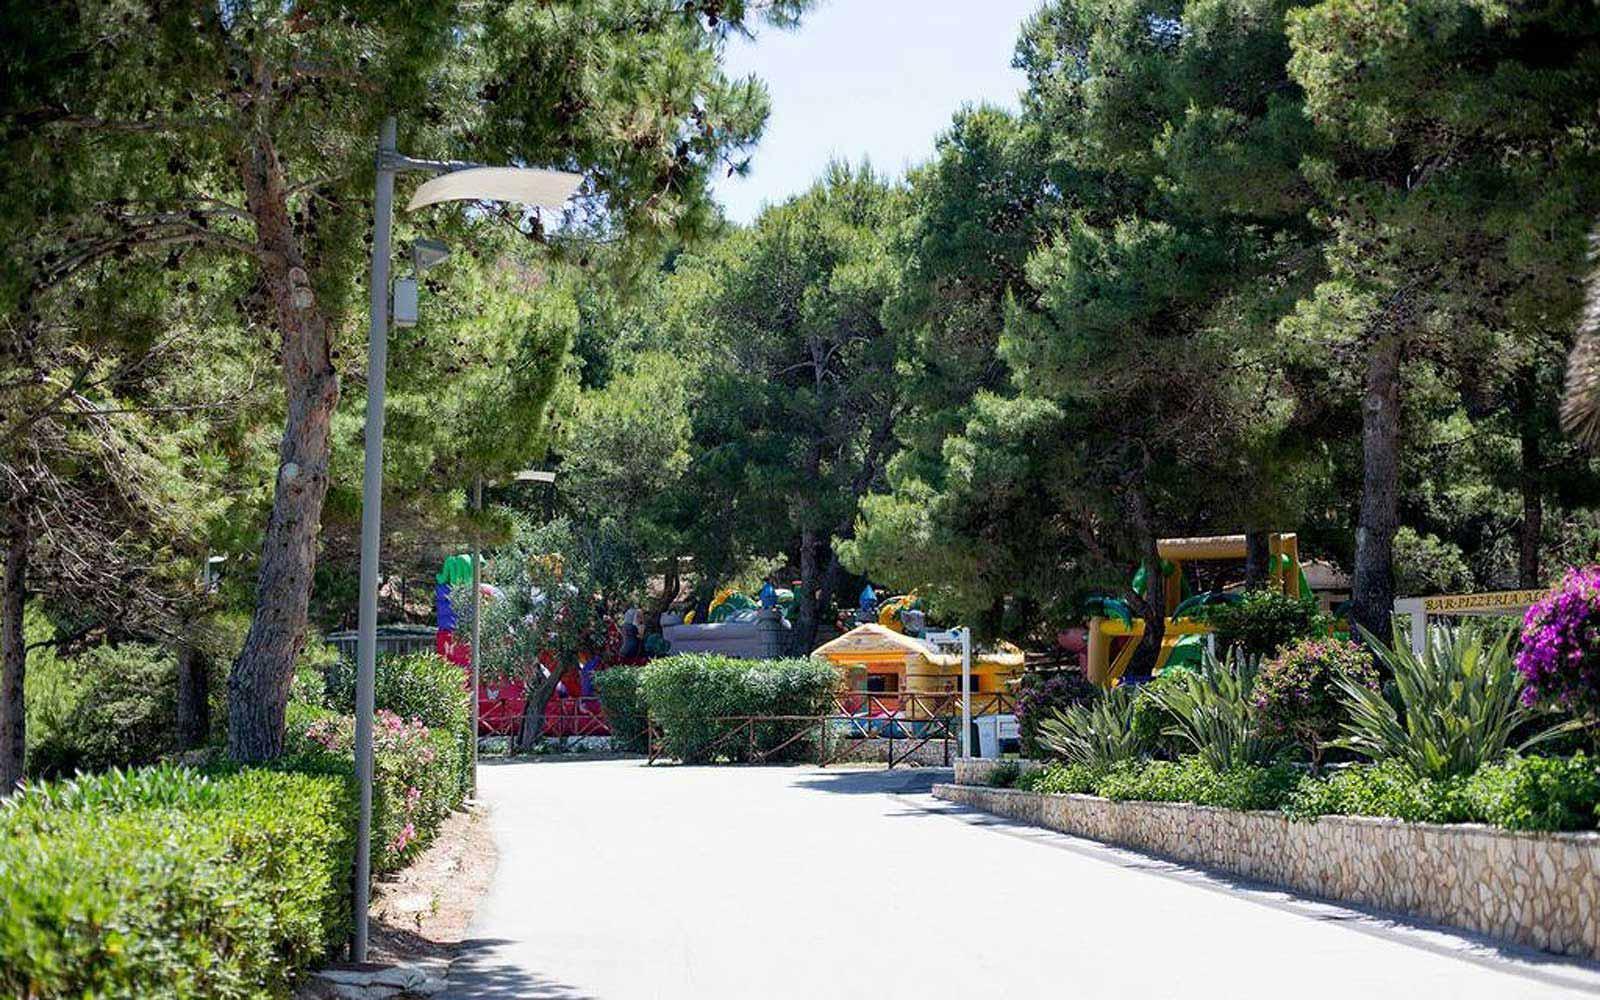 The playground at the Gattarella Resort